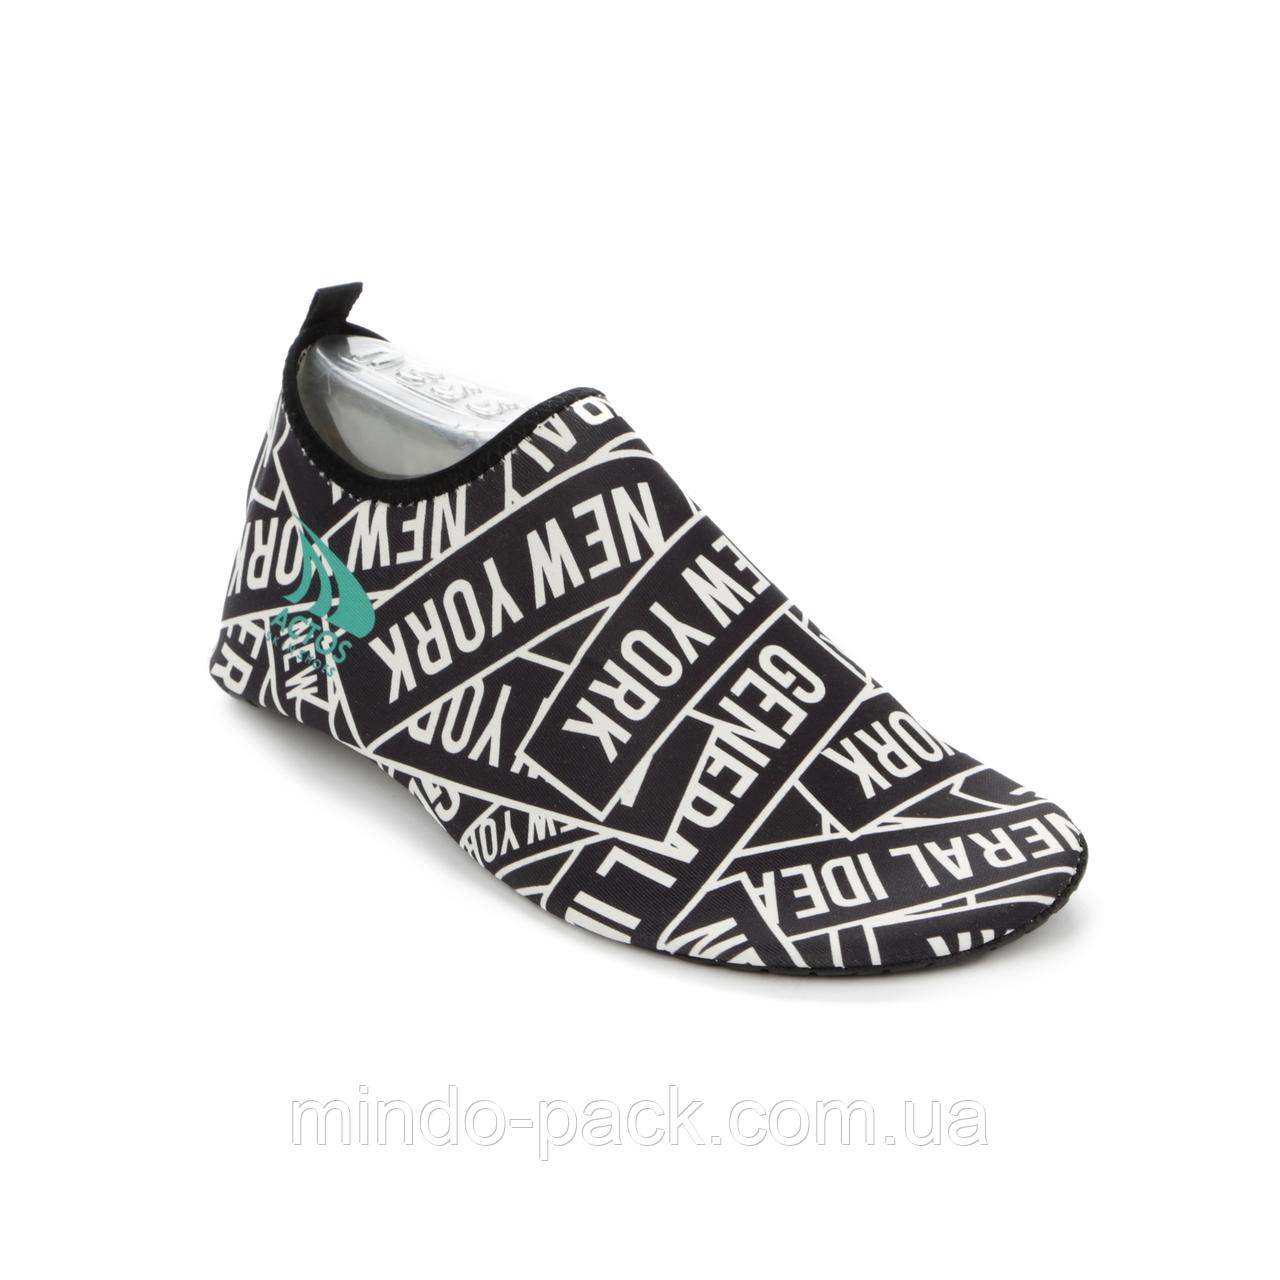 Actos Skin Shoes (разм. 39) (New York Black)